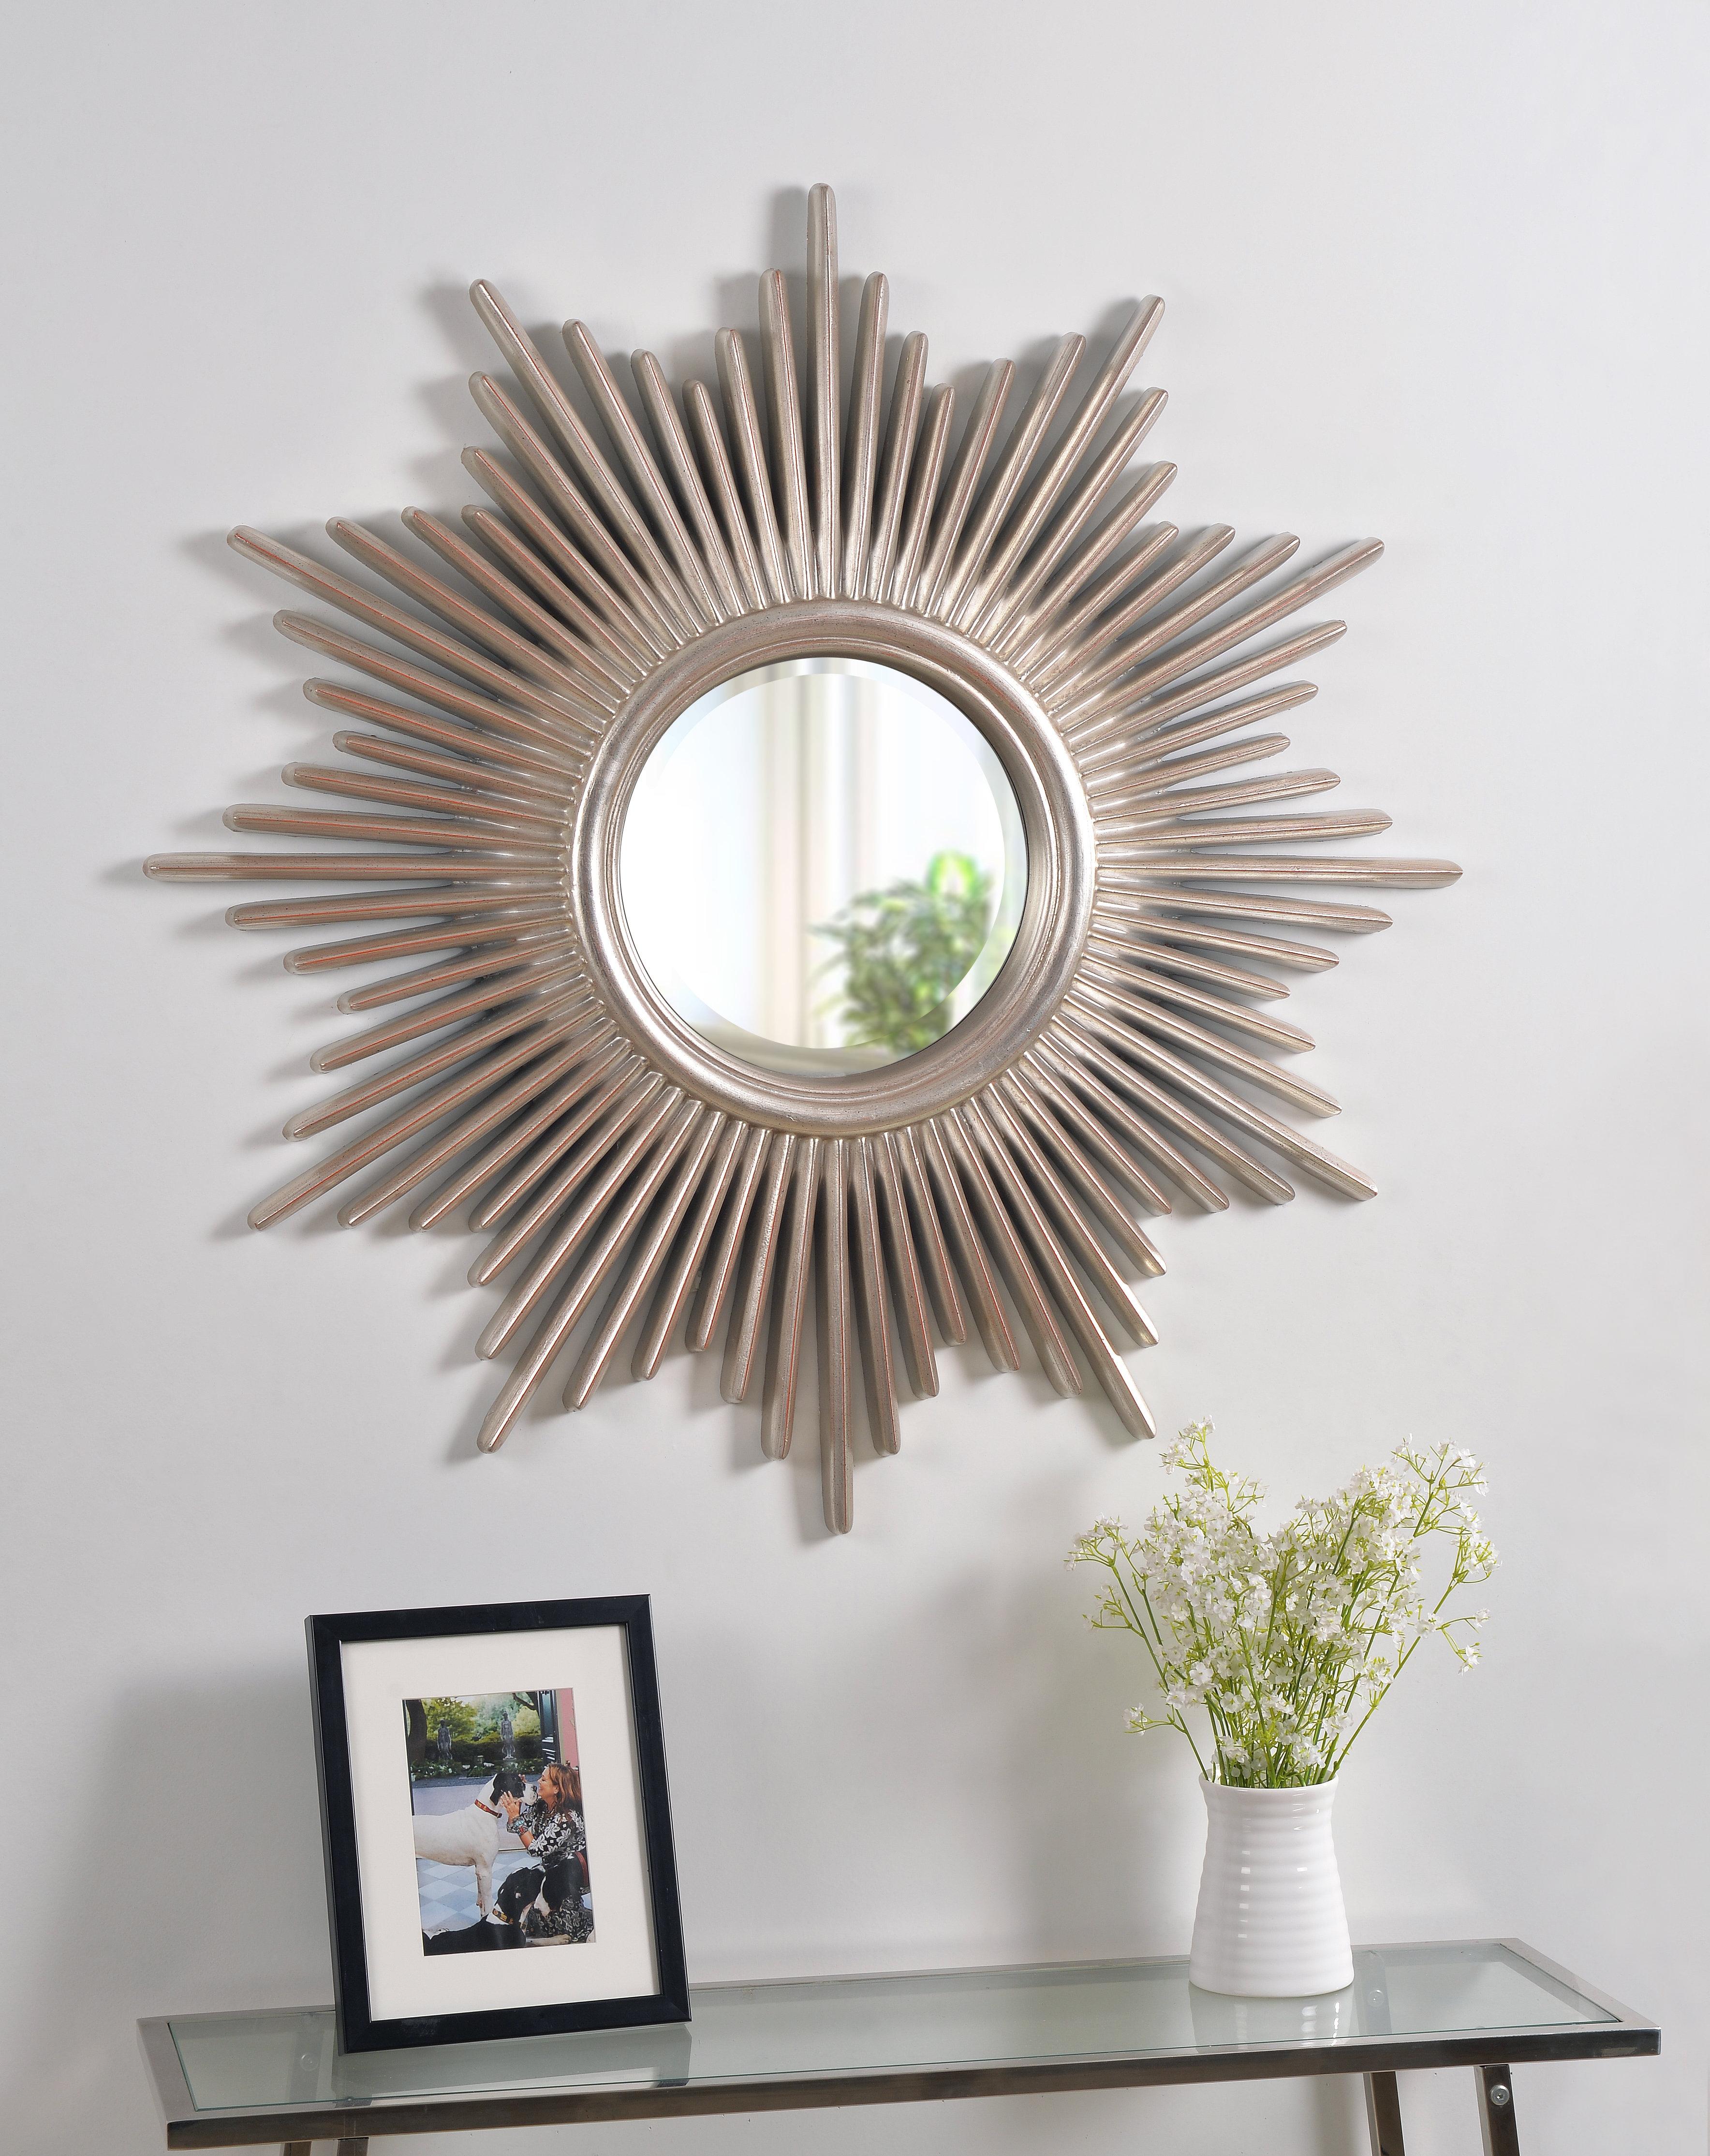 Sunburst Wall Mirrors | Joss & Main With Perillo Burst Wood Accent Mirrors (View 17 of 20)